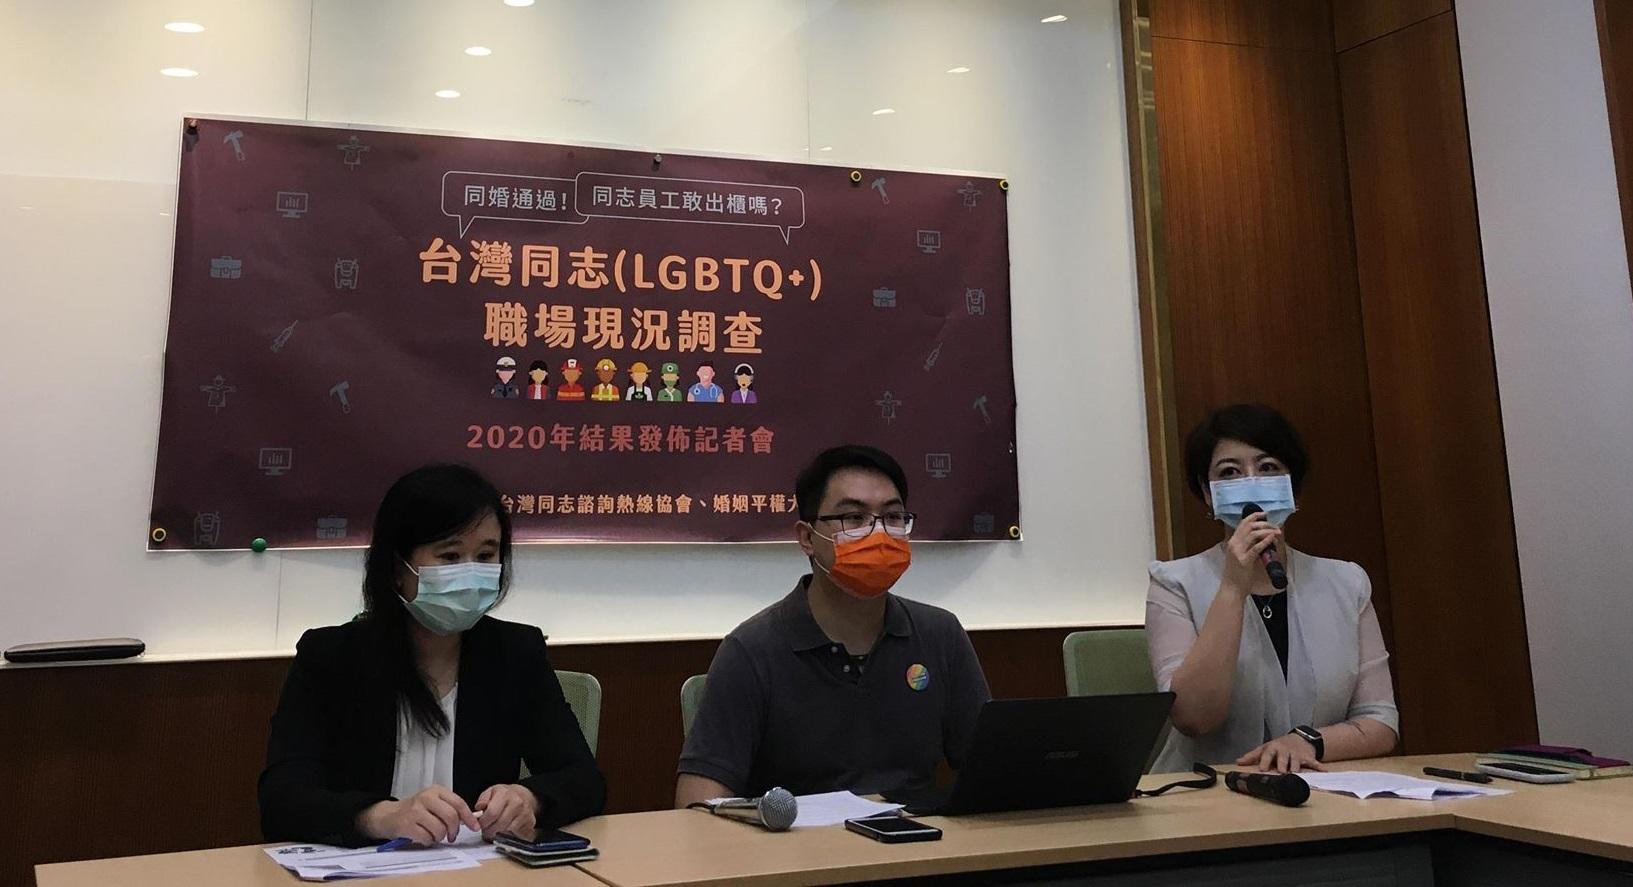 LGBTQ職場現況調查:同婚通過,同志員工敢出櫃嗎?